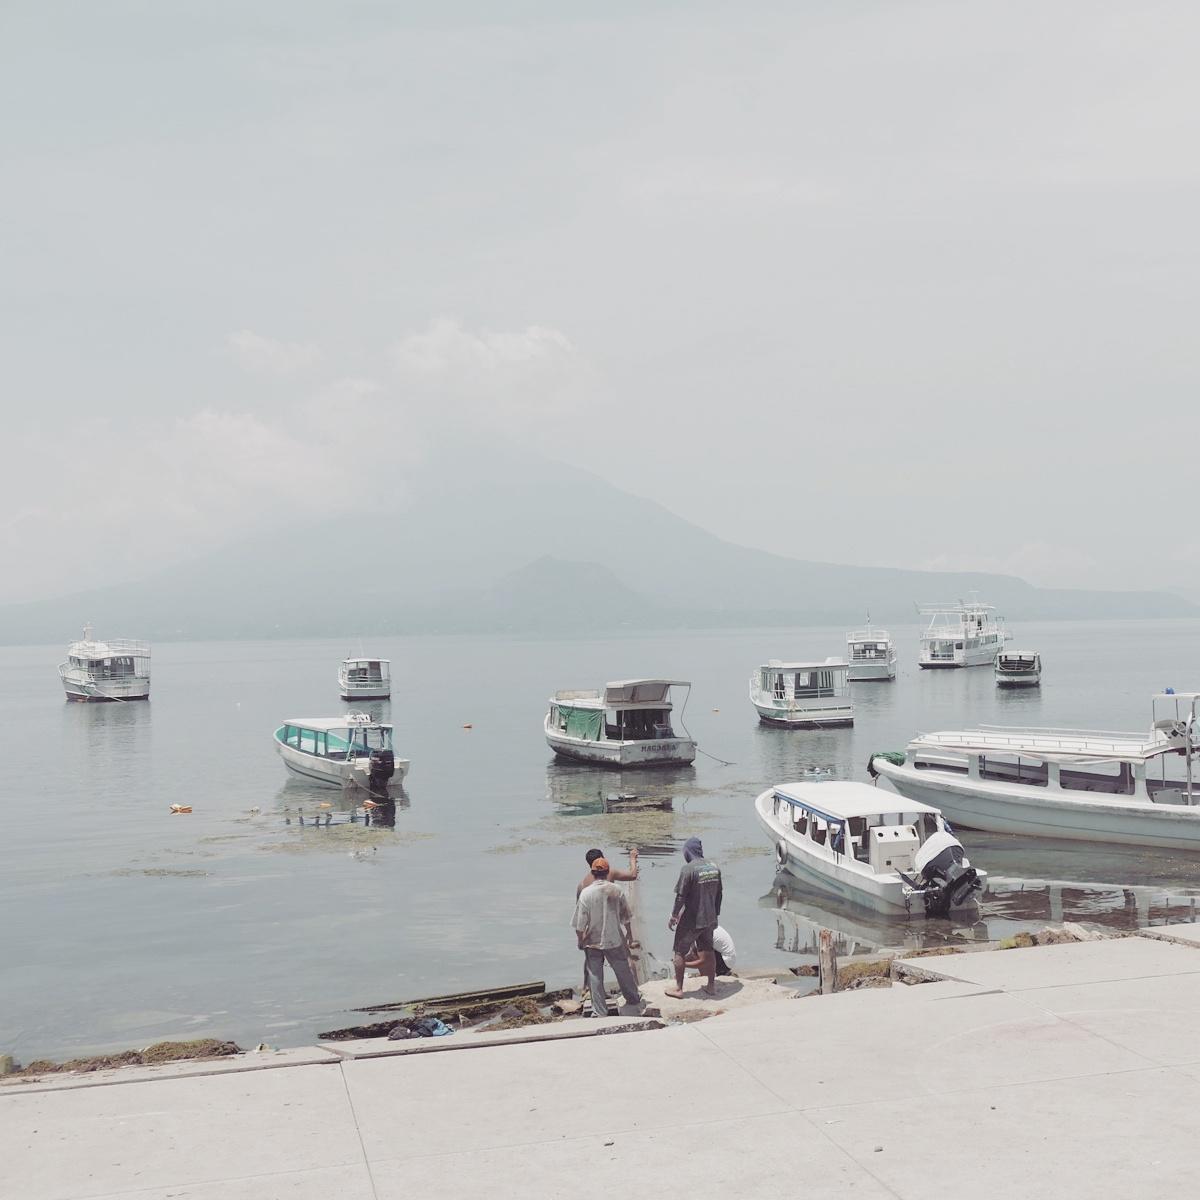 Lake Atitlan, former home of the Atitlan Grebe. Noah Strycker